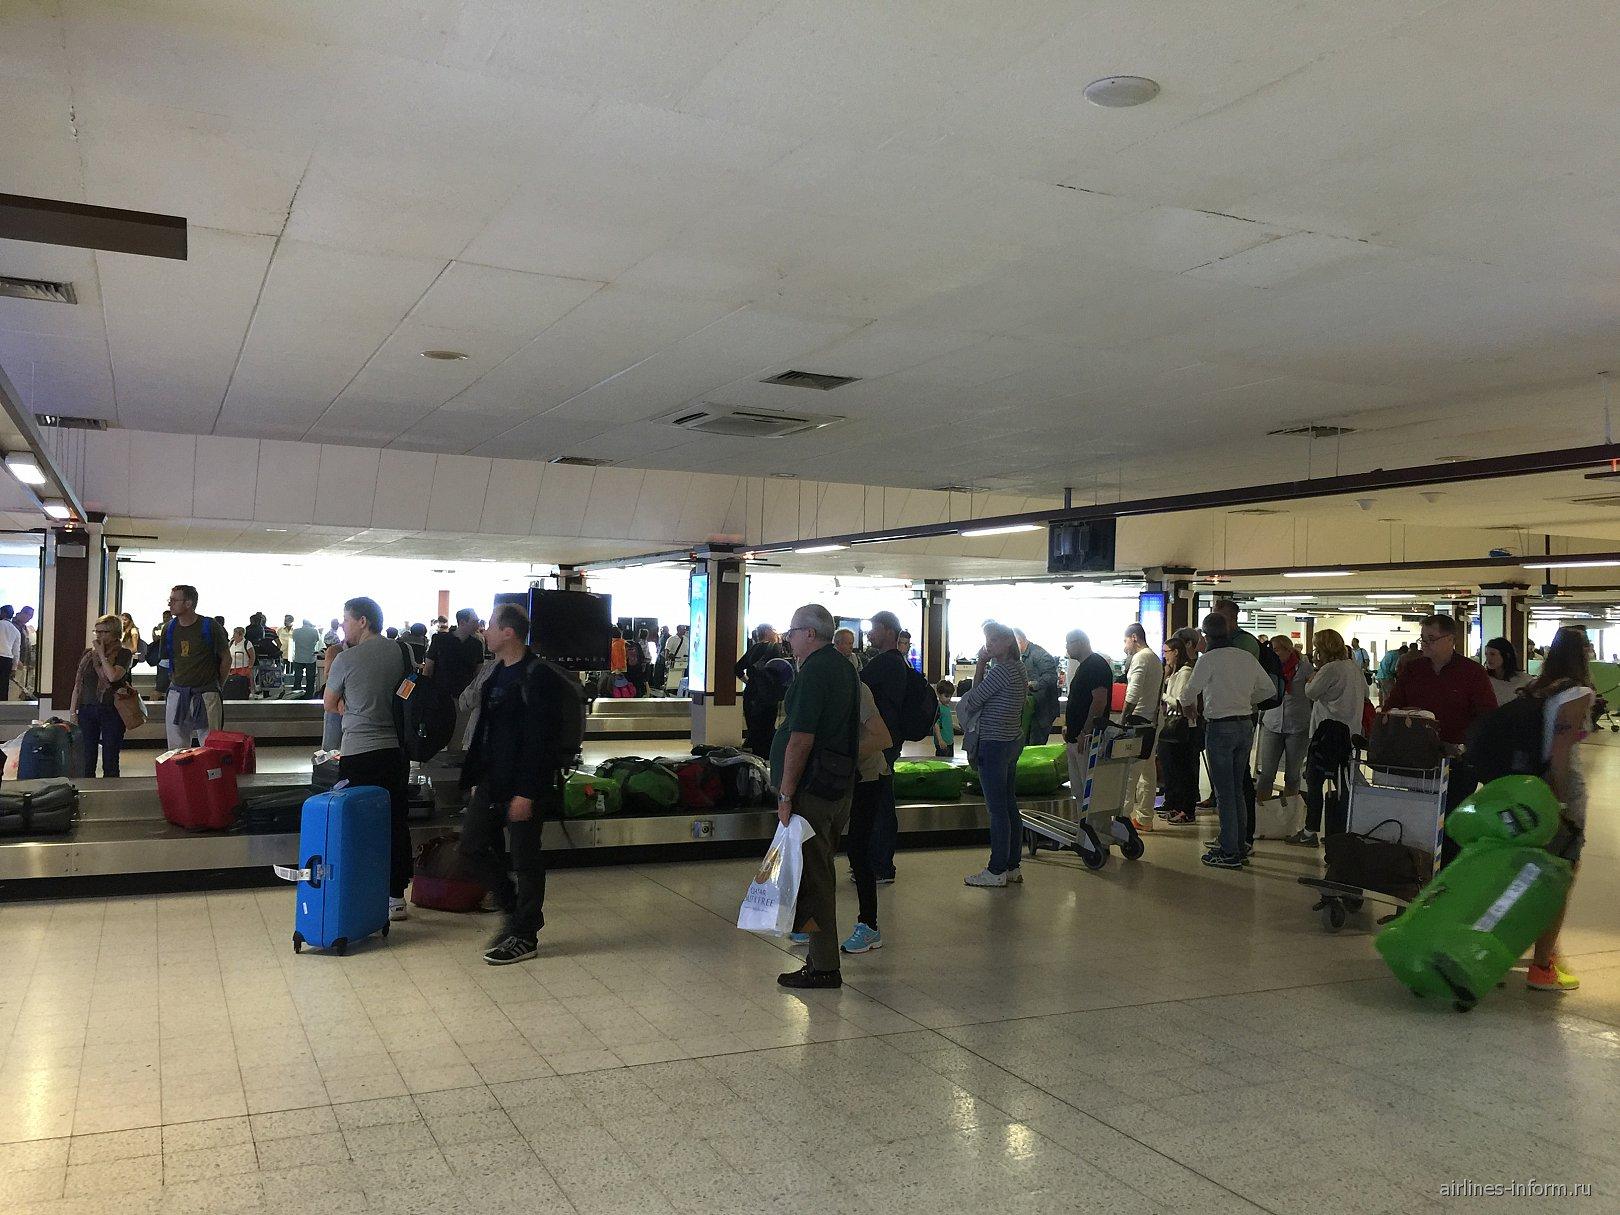 Зал выдачи багажа в аэропорту Мале Ибрагим Насир